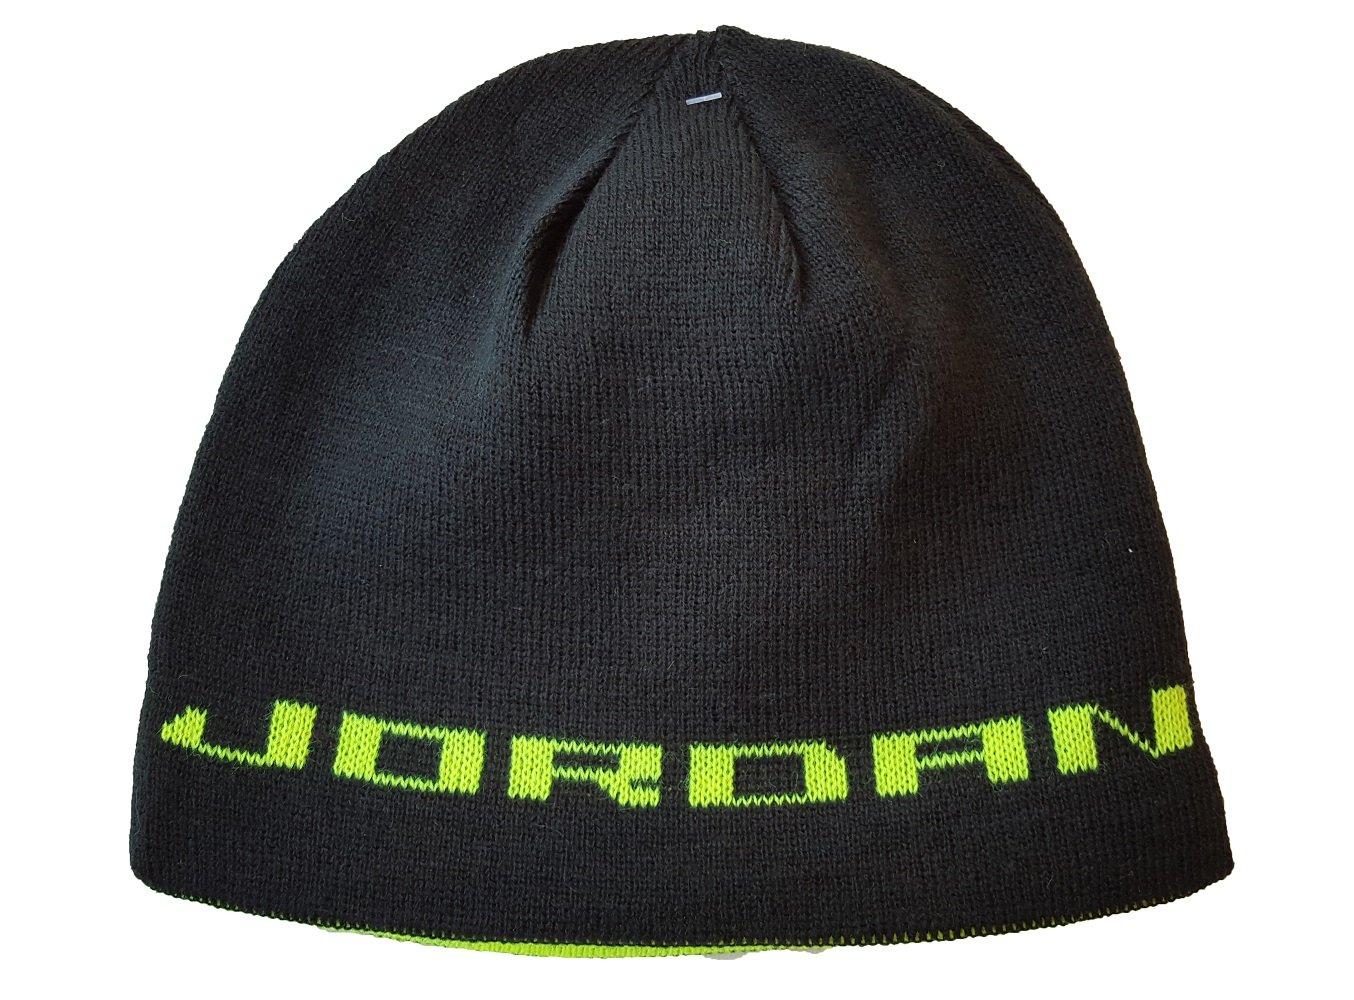 81ed2fe3a78e6 Amazon.com  NIKE Jordan Jumpman Boys Reversible Knit Hat Black Volt Youth  8 20  Sports   Outdoors